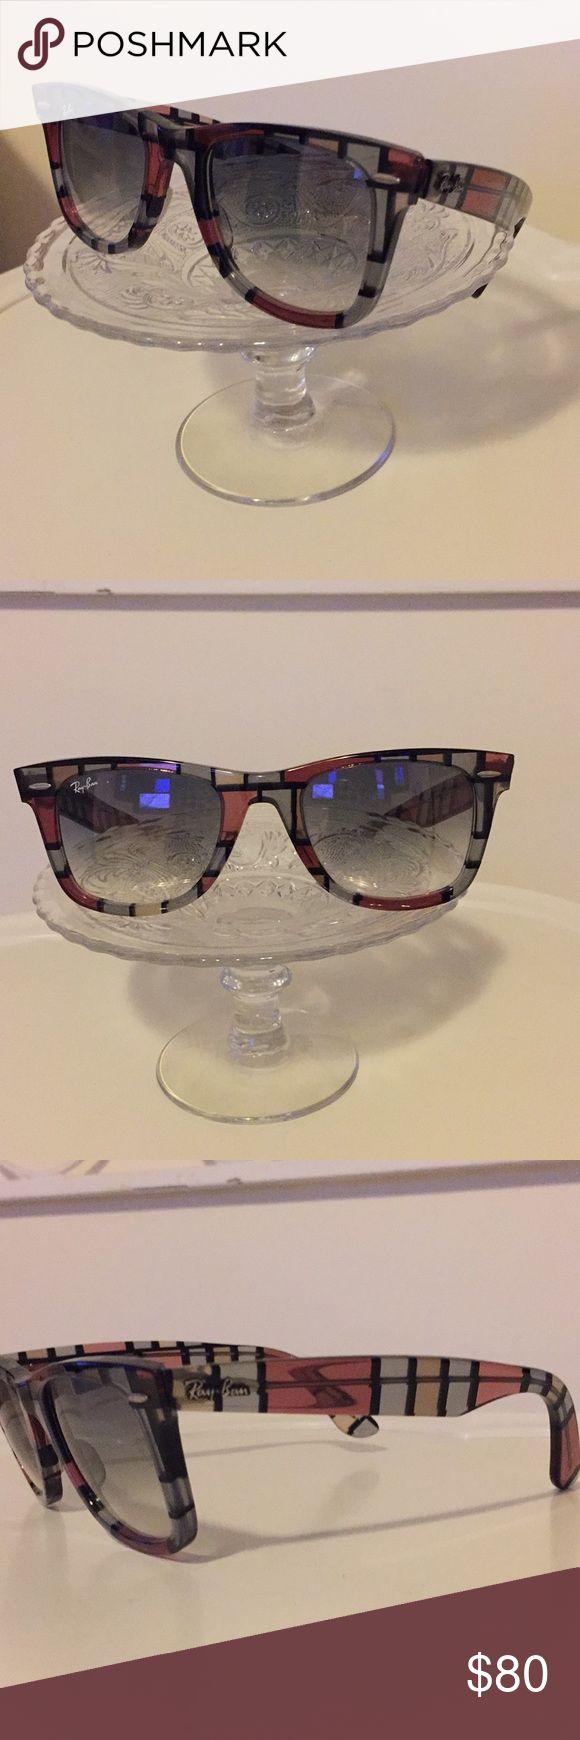 RayBan wayfarer sunglasses RayBan special series plaid print (pink, grey/blue, clear, black). Grey/black lenses (gradient). Non-polarized. Ray-Ban Accessories Sunglasses